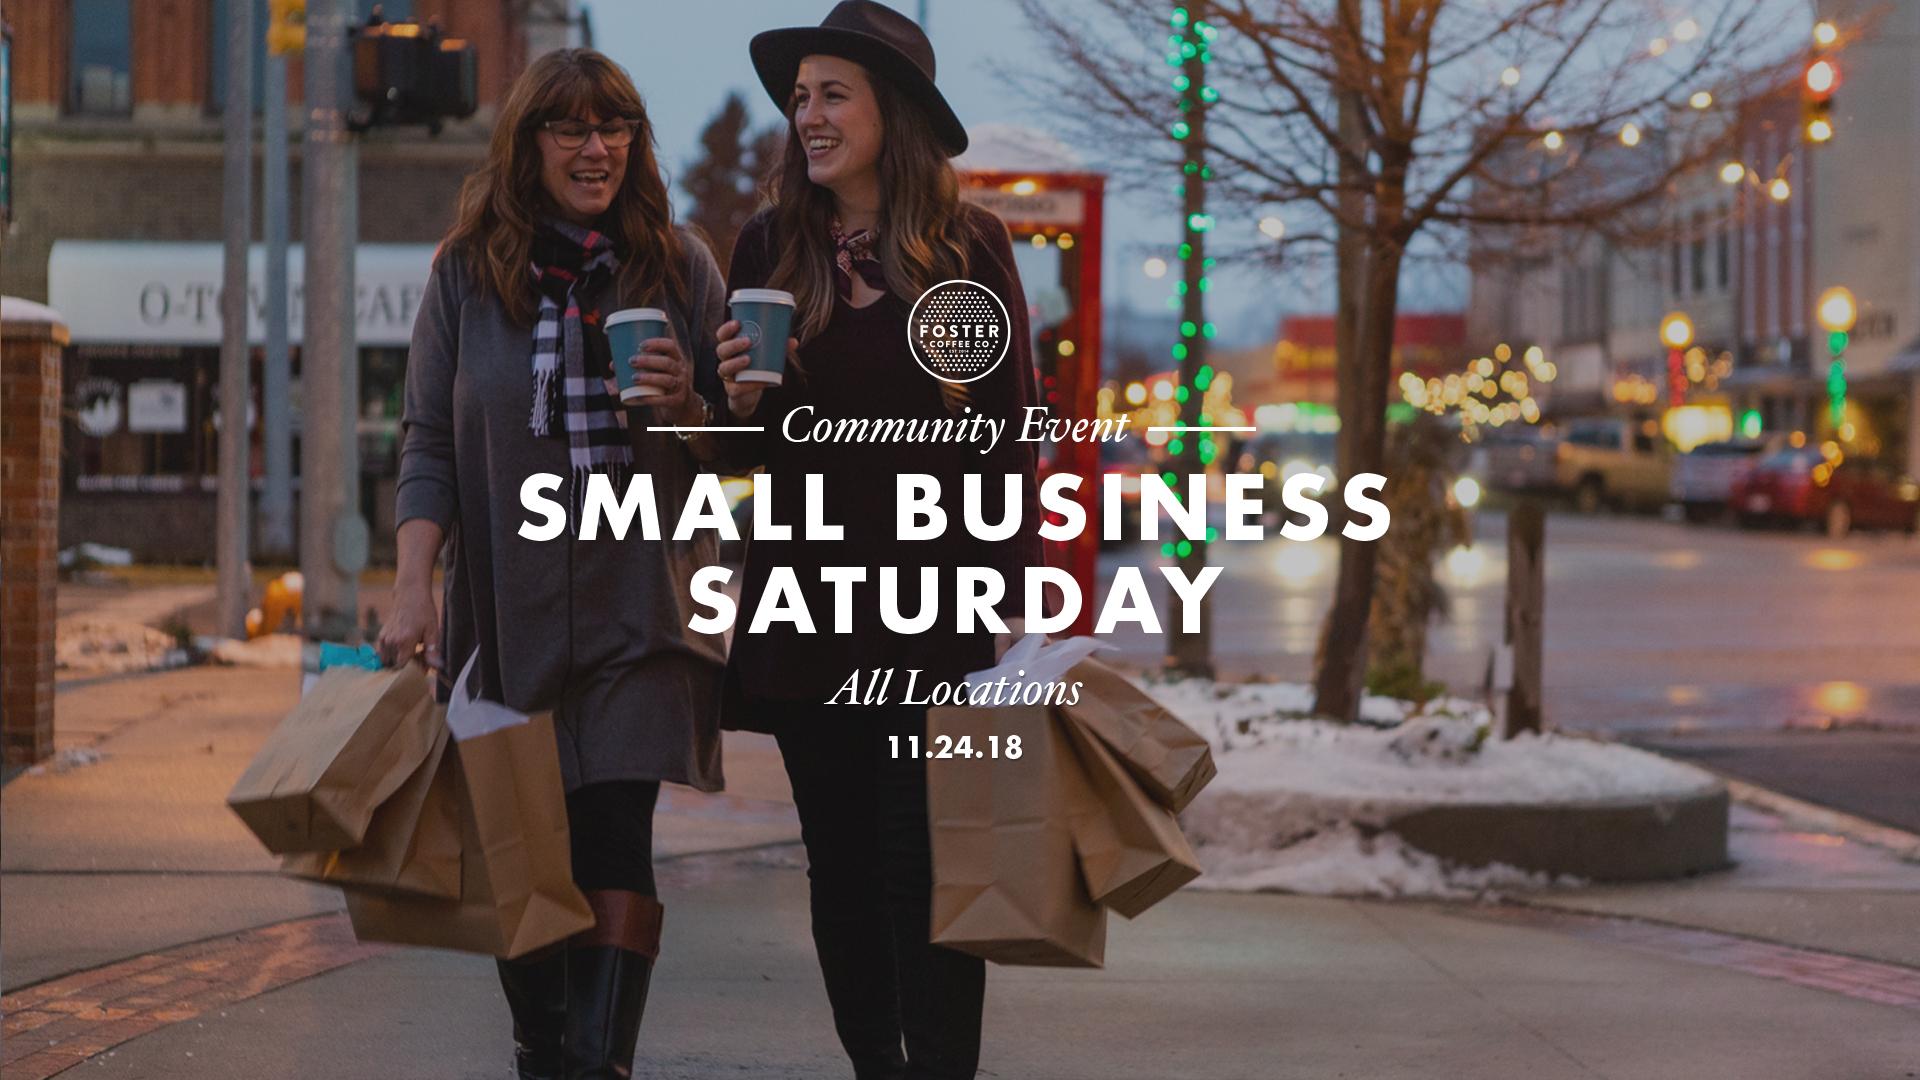 Small_Business_Saturday_2018.jpg